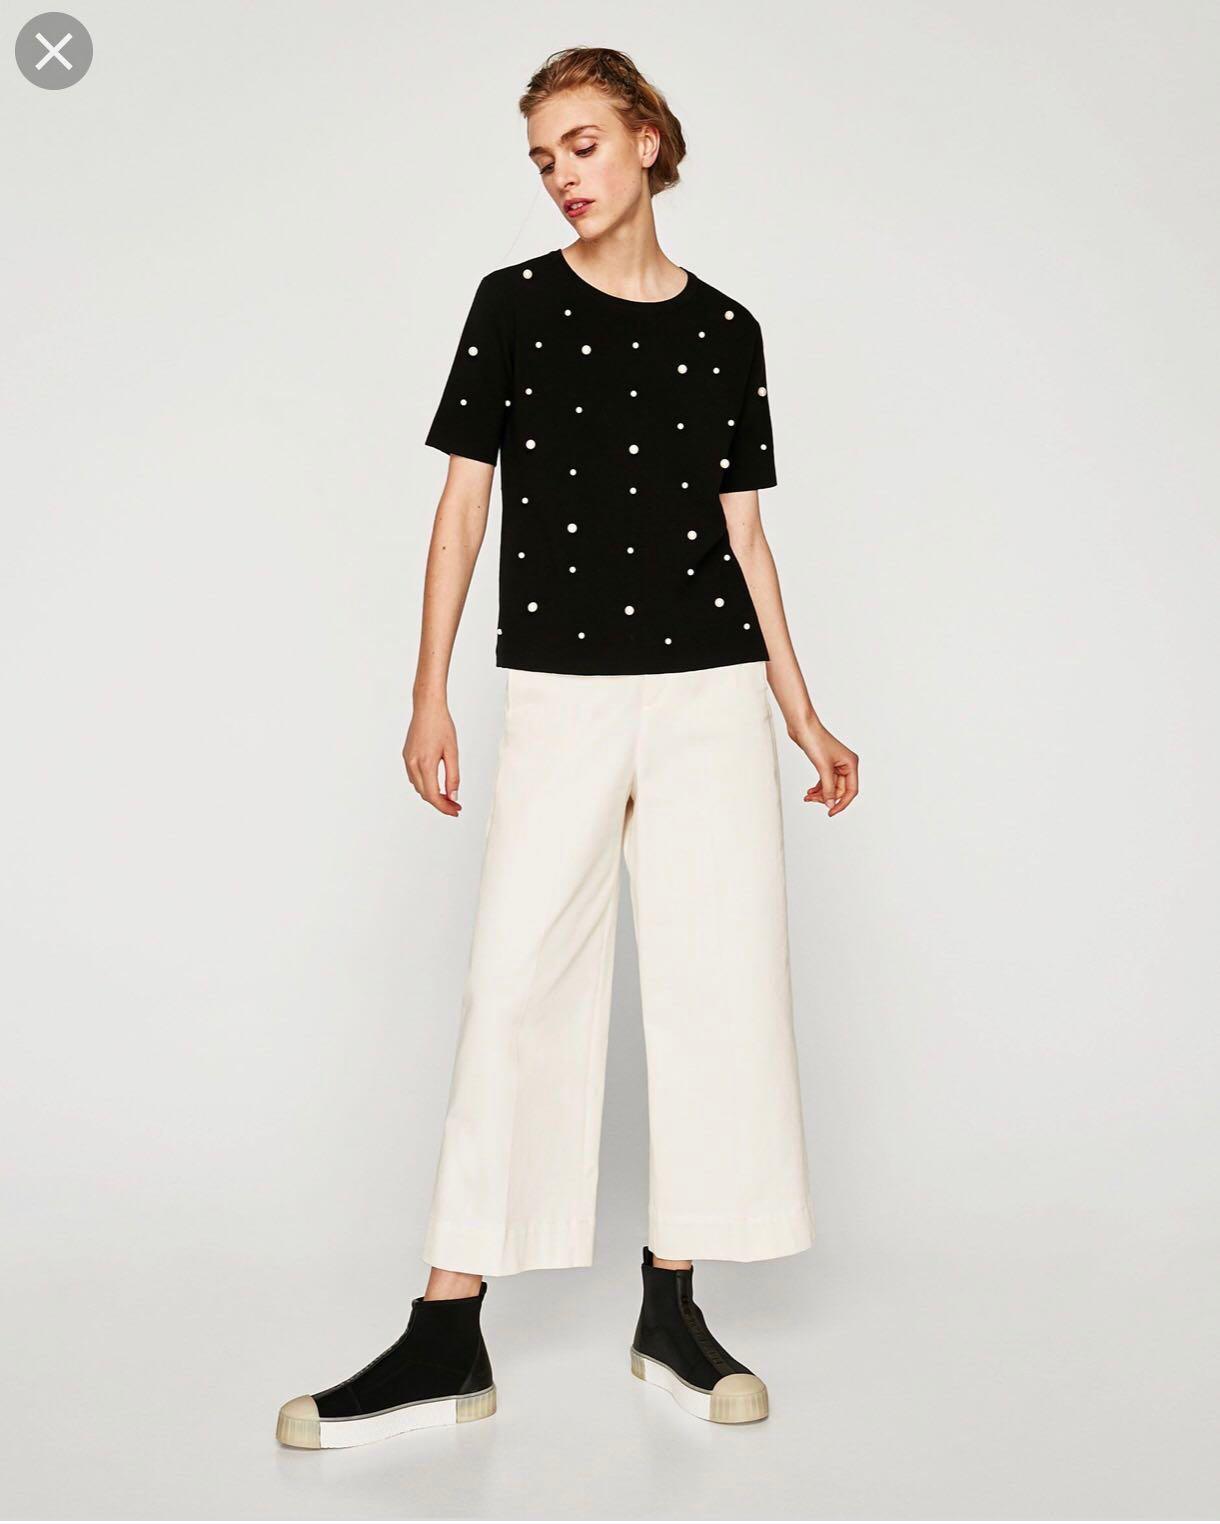 fbb9fda76cc72 🌼zara top🌼 women fashion clothes tops on carousell jpg 1220x1524 Zara tops